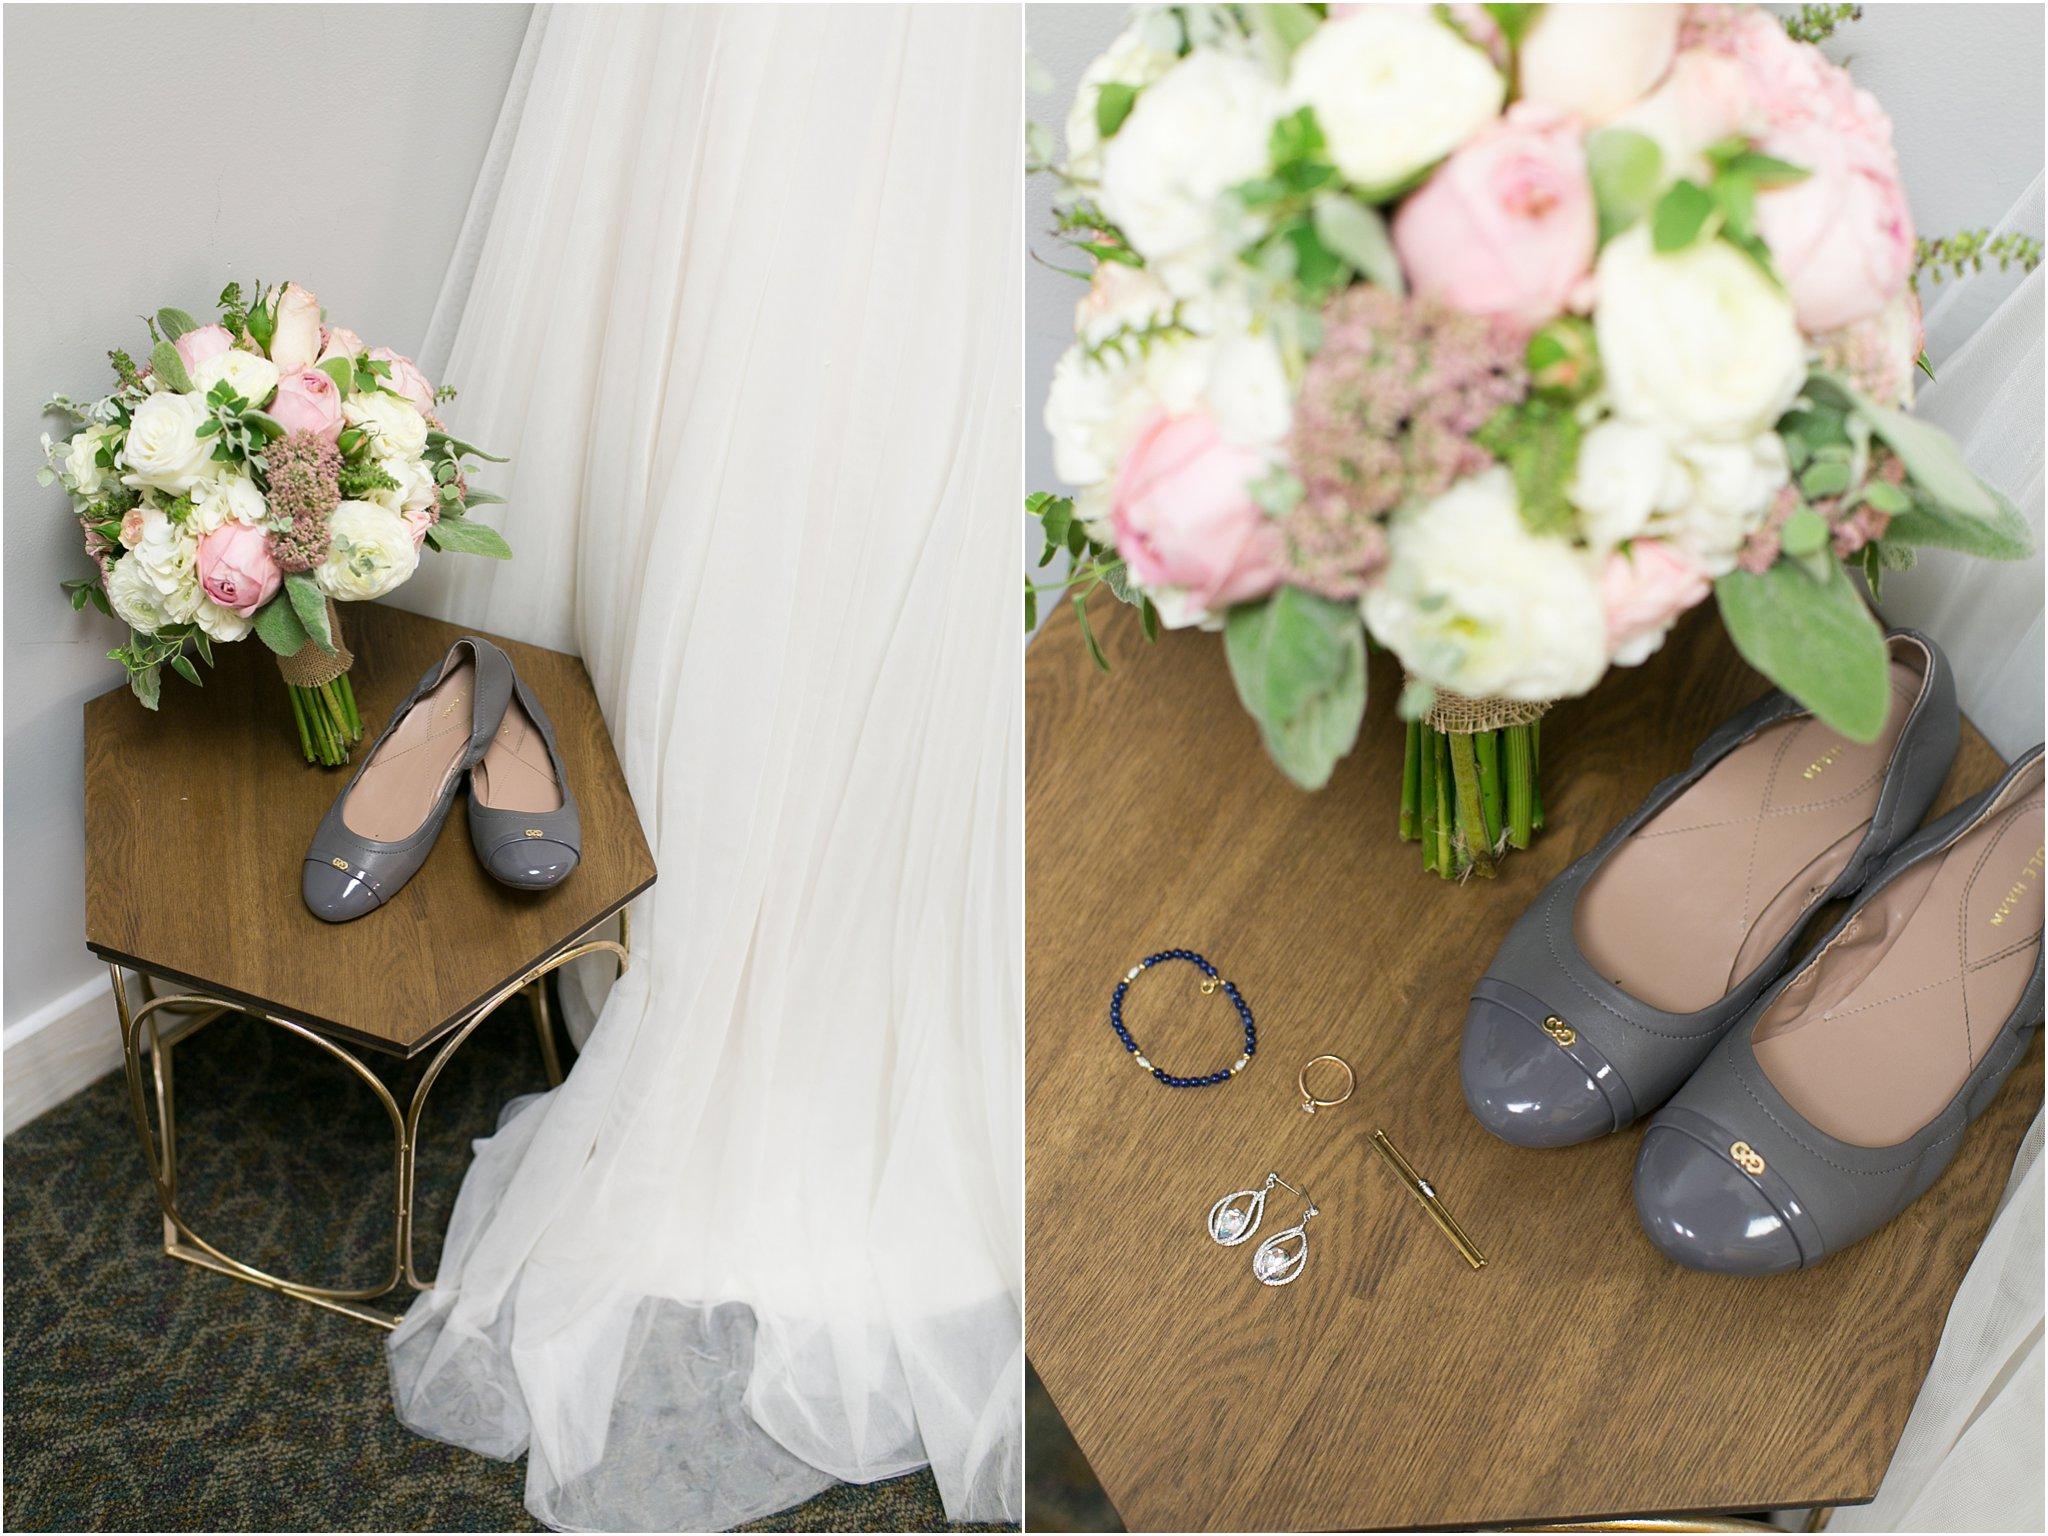 jessica_ryan_photography_virginia_wedding_photographer_wedding_hurricane_norfolk_botanical_gardens_hurricane_matthew_wedding_3543